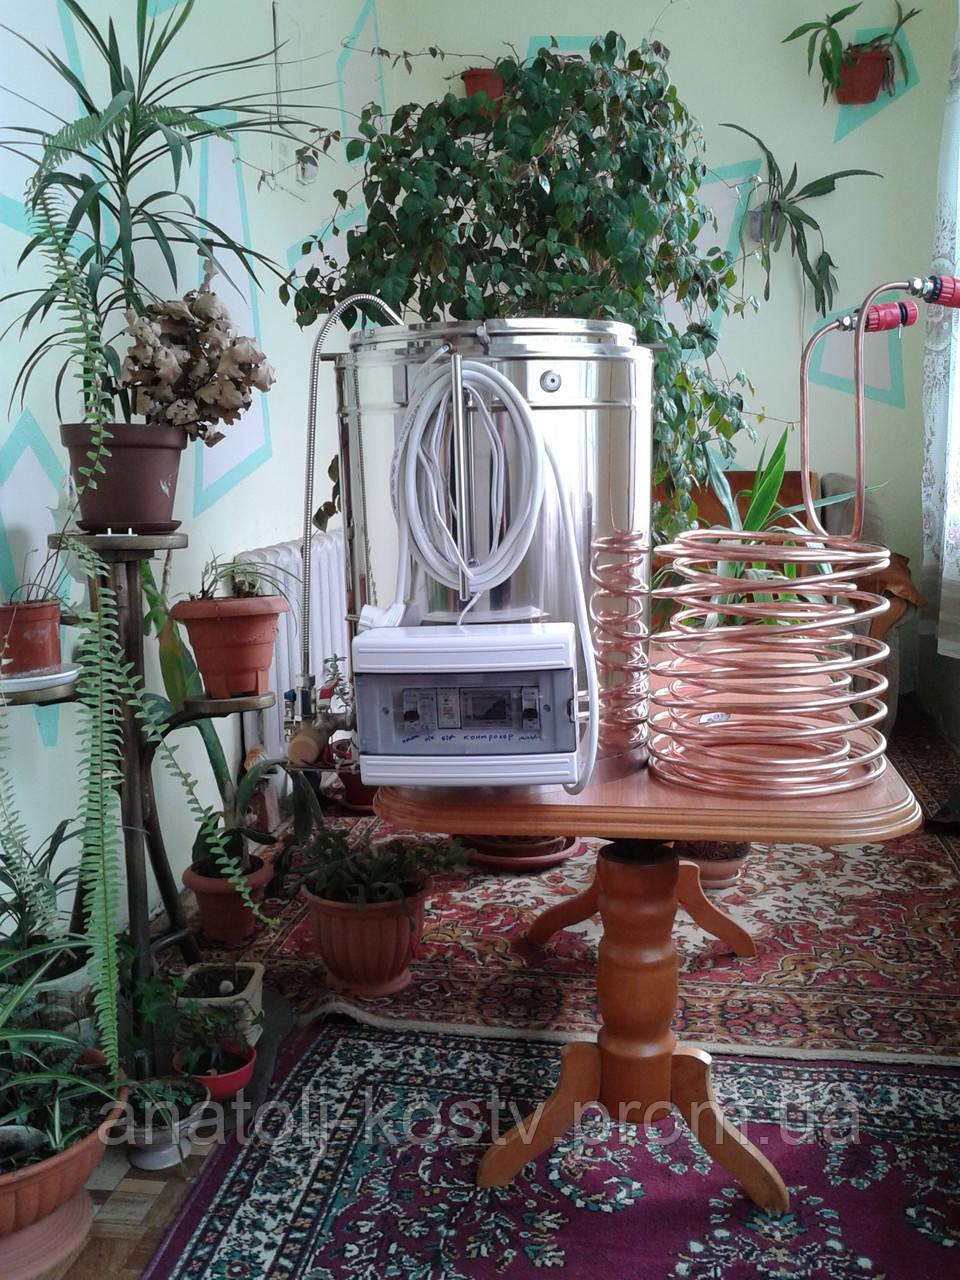 Минипивоварня (домашняя), с програмным управлением  - Анатолій Костів в Ужгороде